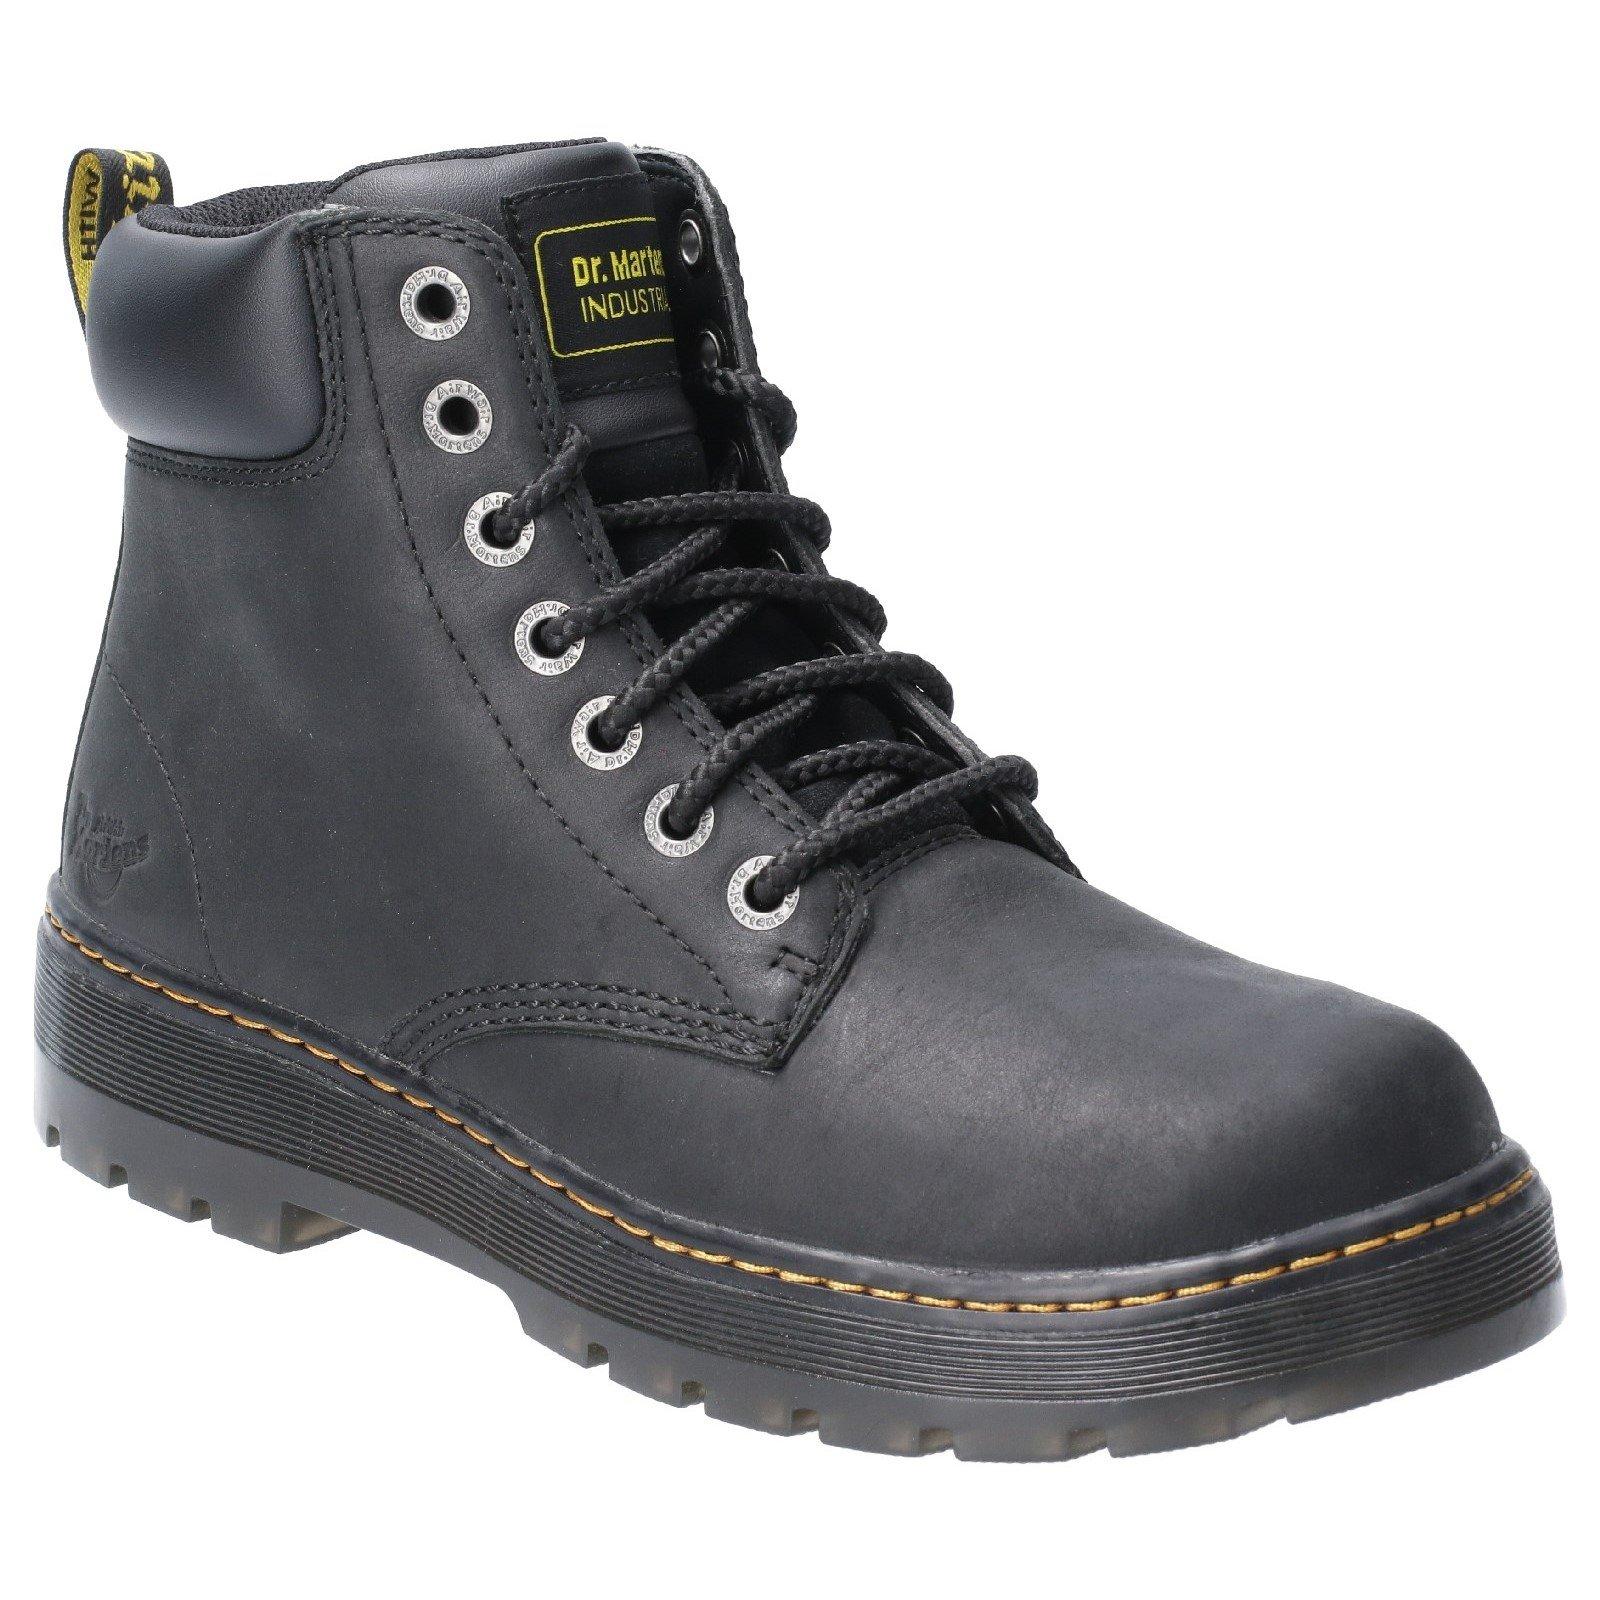 Dr Martens Men's Winch Non-Safety Work Boot Black 29821 - Black 6